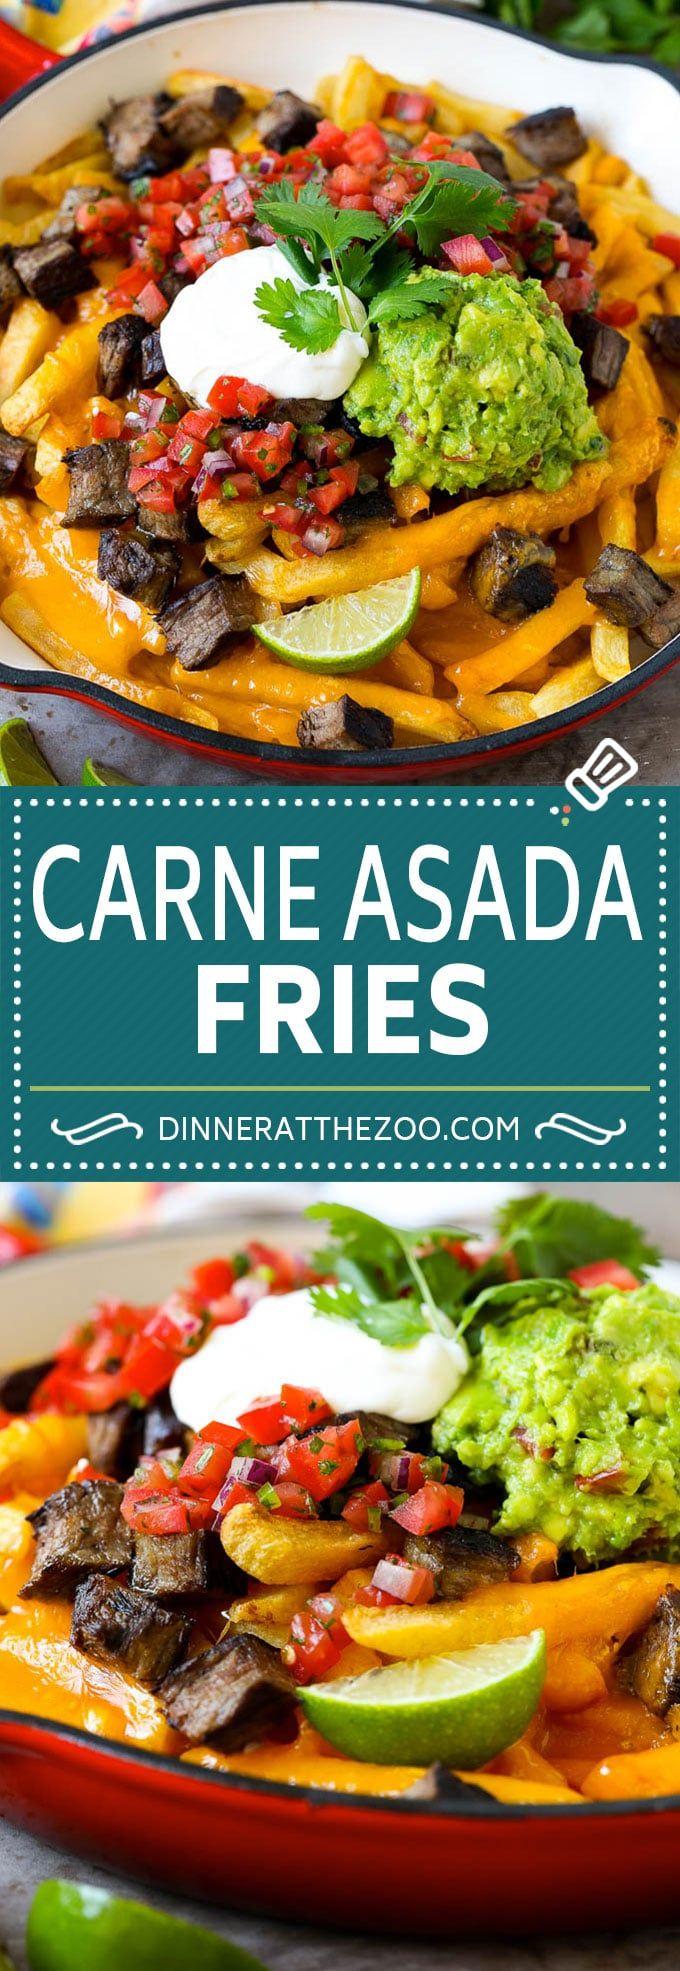 Carne Asada Fries Carne Asada Fries Recipe | Steak Fries